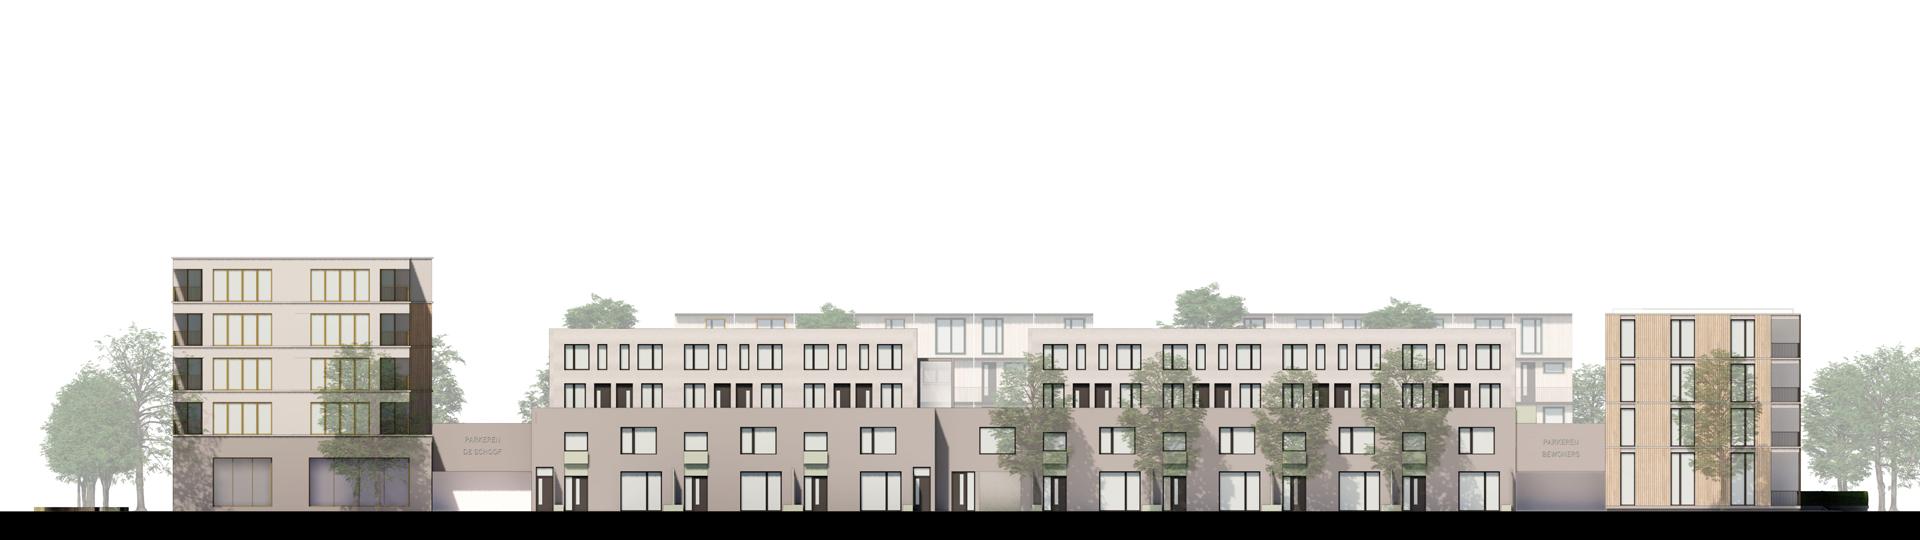 heart-ambacht-lagado-architects-gevel-EP-1